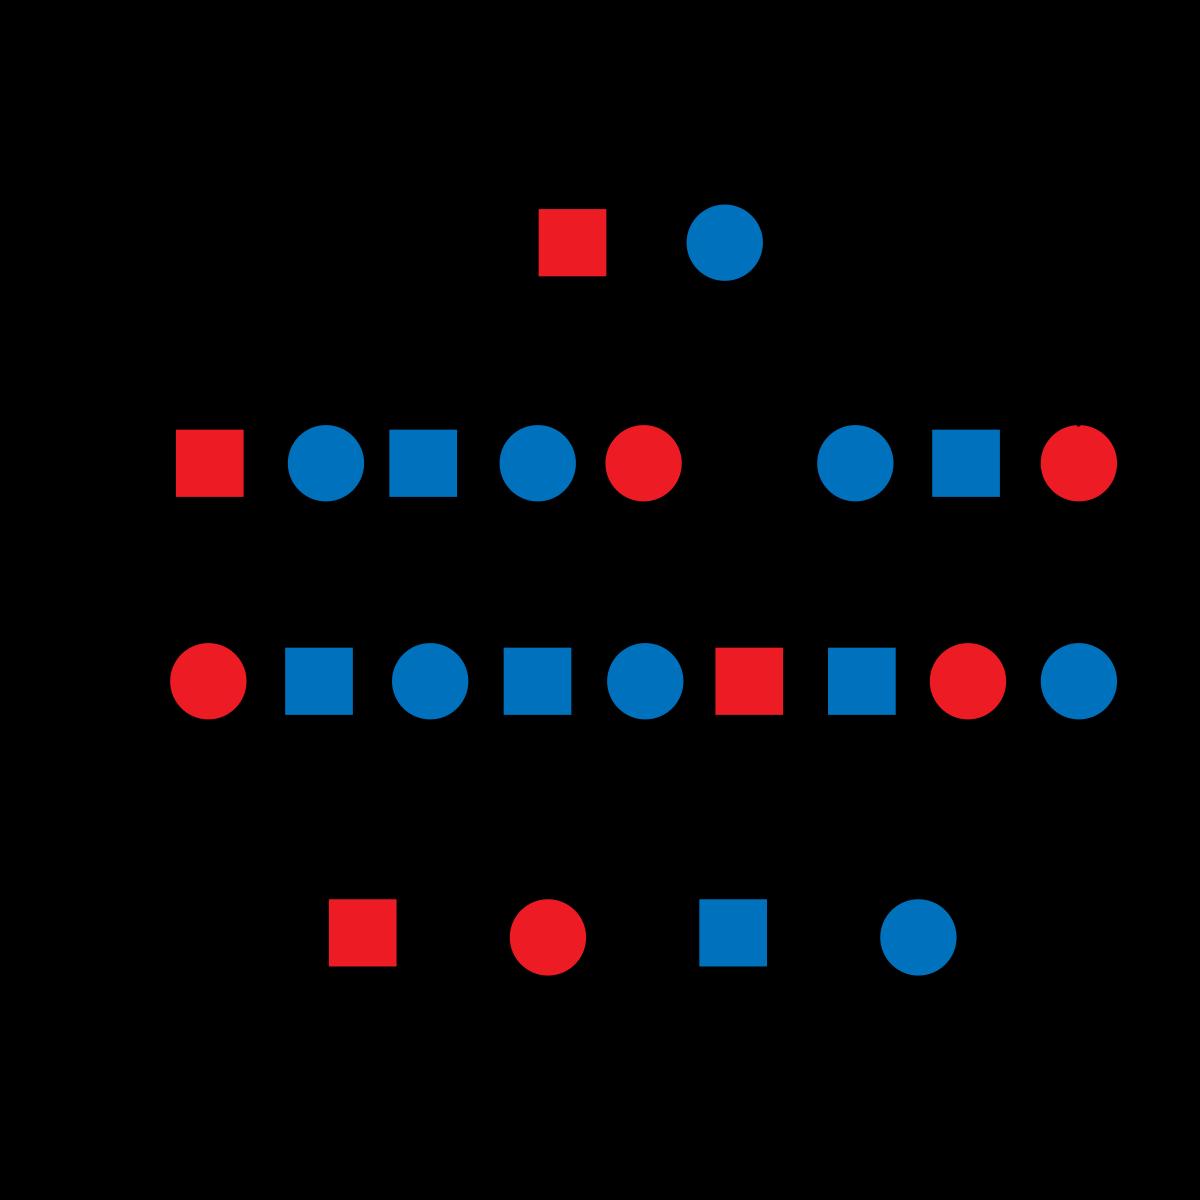 Fișier:Autosomal Dominant Pedigree kd-group.ro - Wikipedia